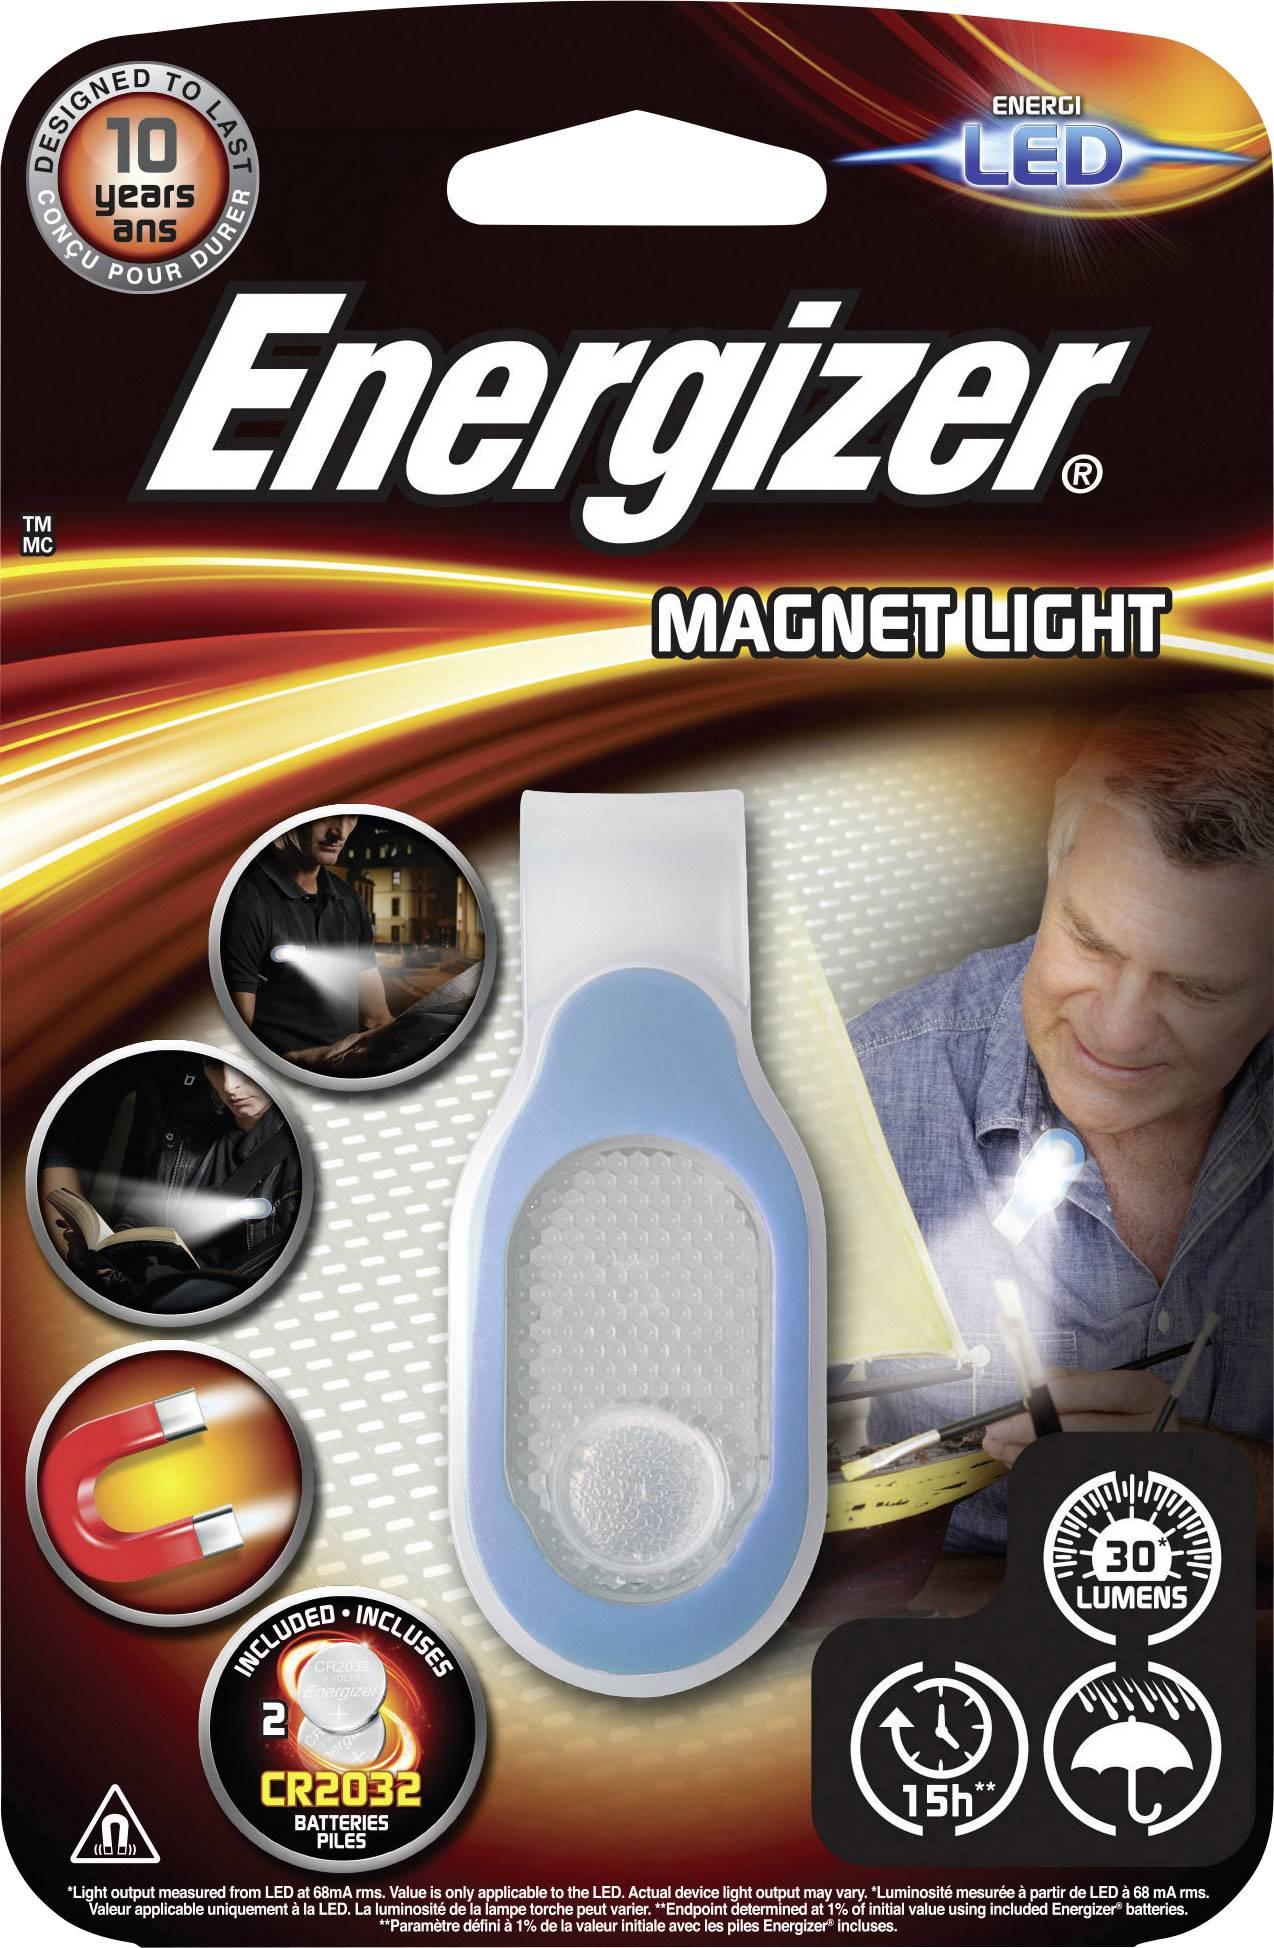 Led Support Poche Magnet De Energizer Mini Lampe Light Avec FJK1cTl3